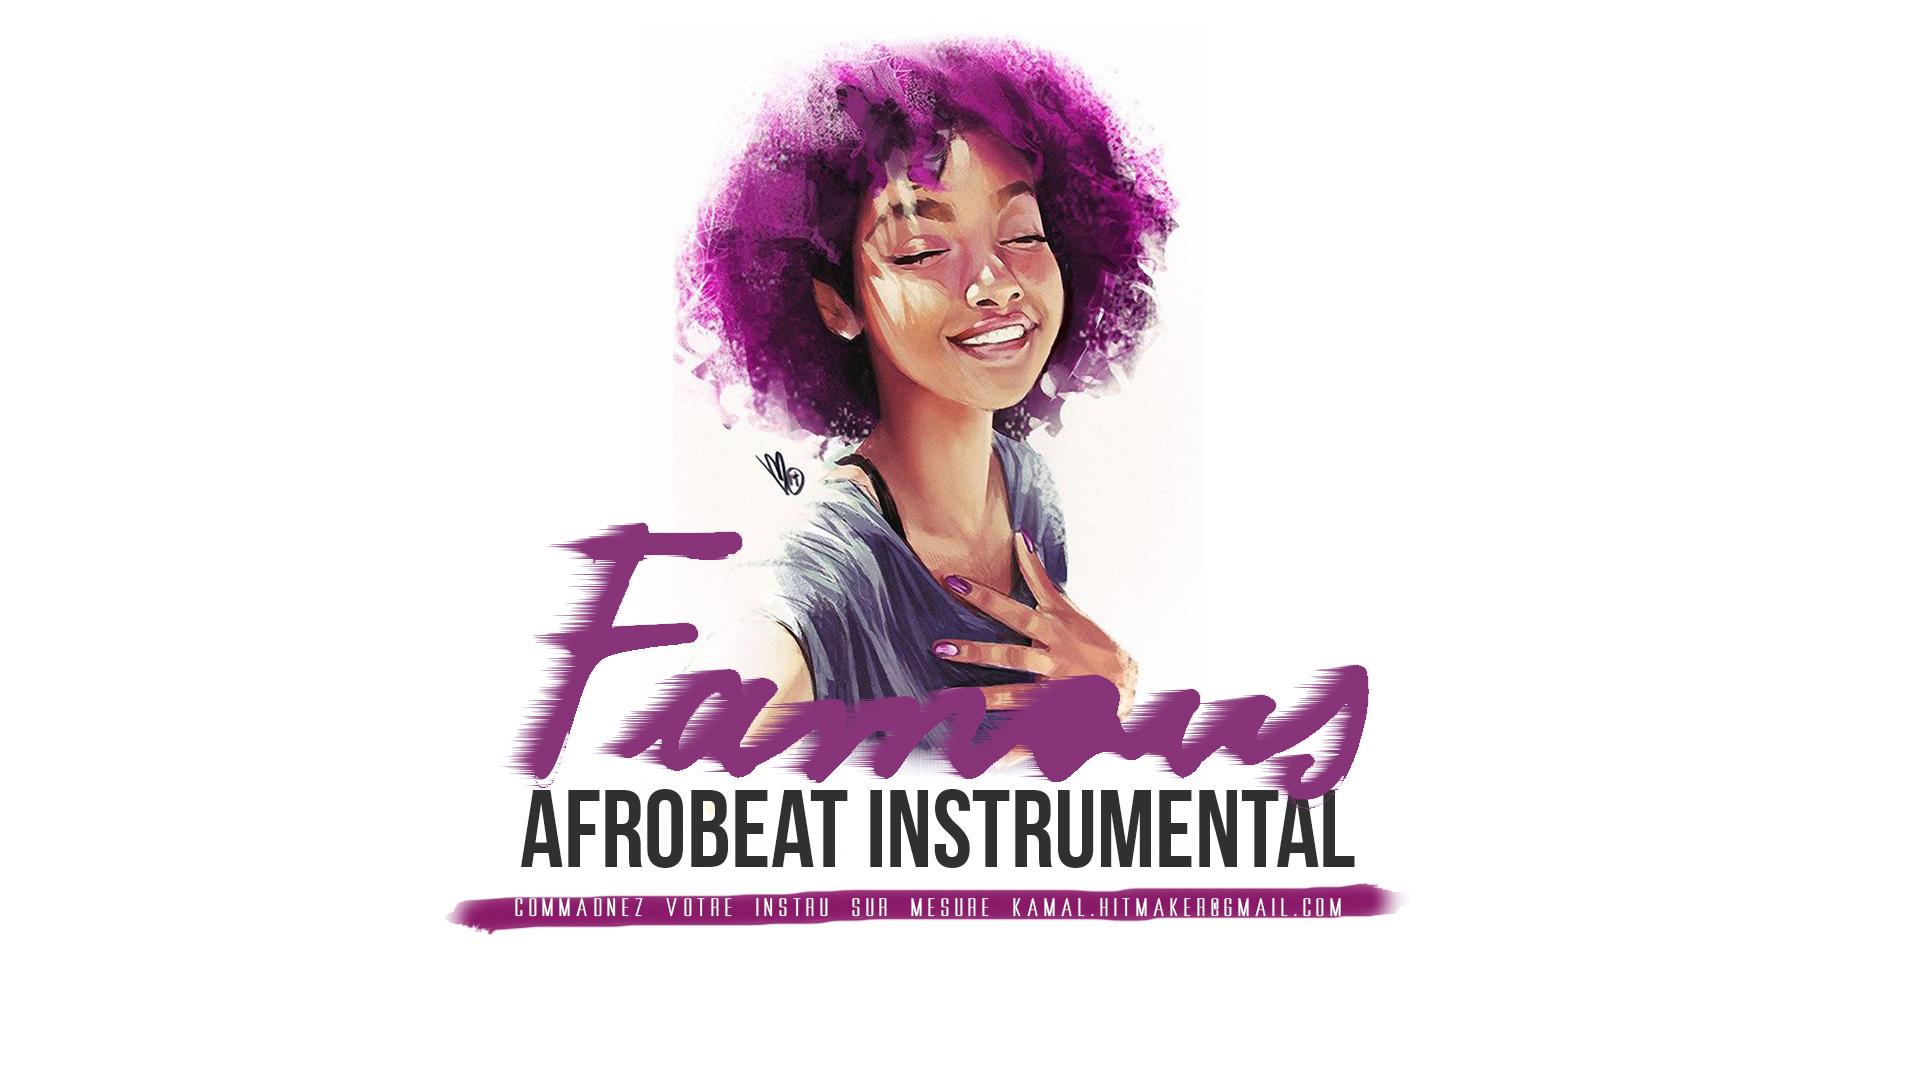 Instru Afrobeat Famous Prod by Kamal Beatmaker